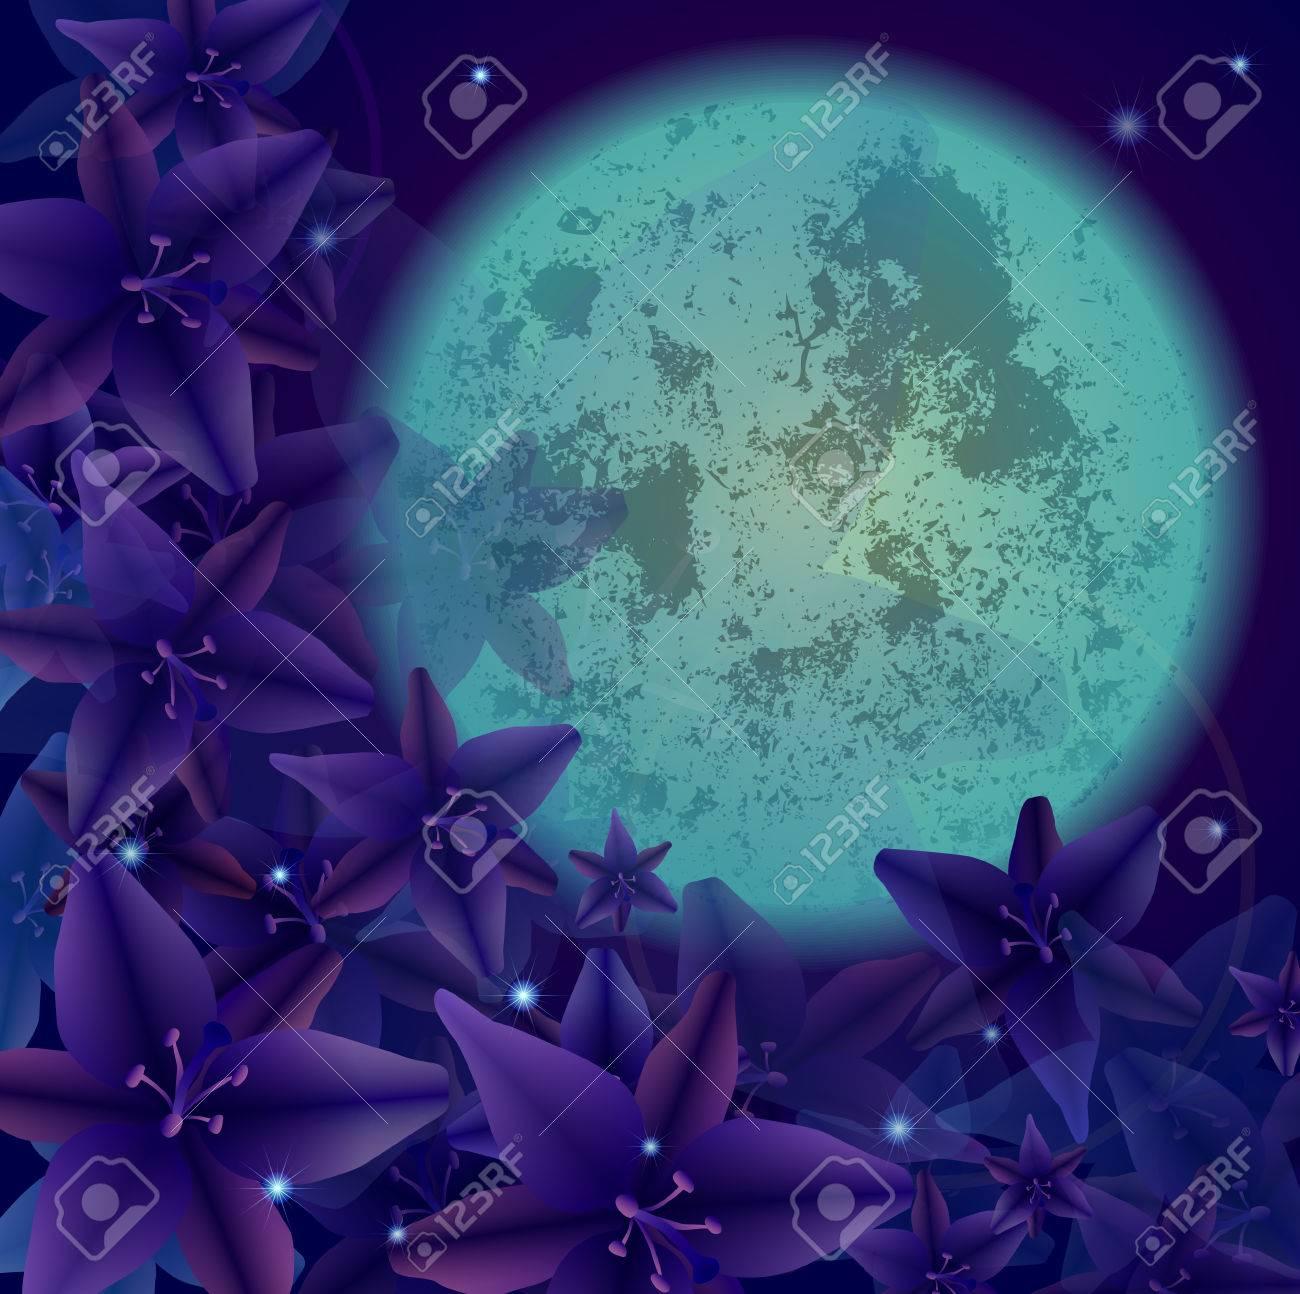 illustration of night flowers, background, vector clip-art Stock Vector - 23238815